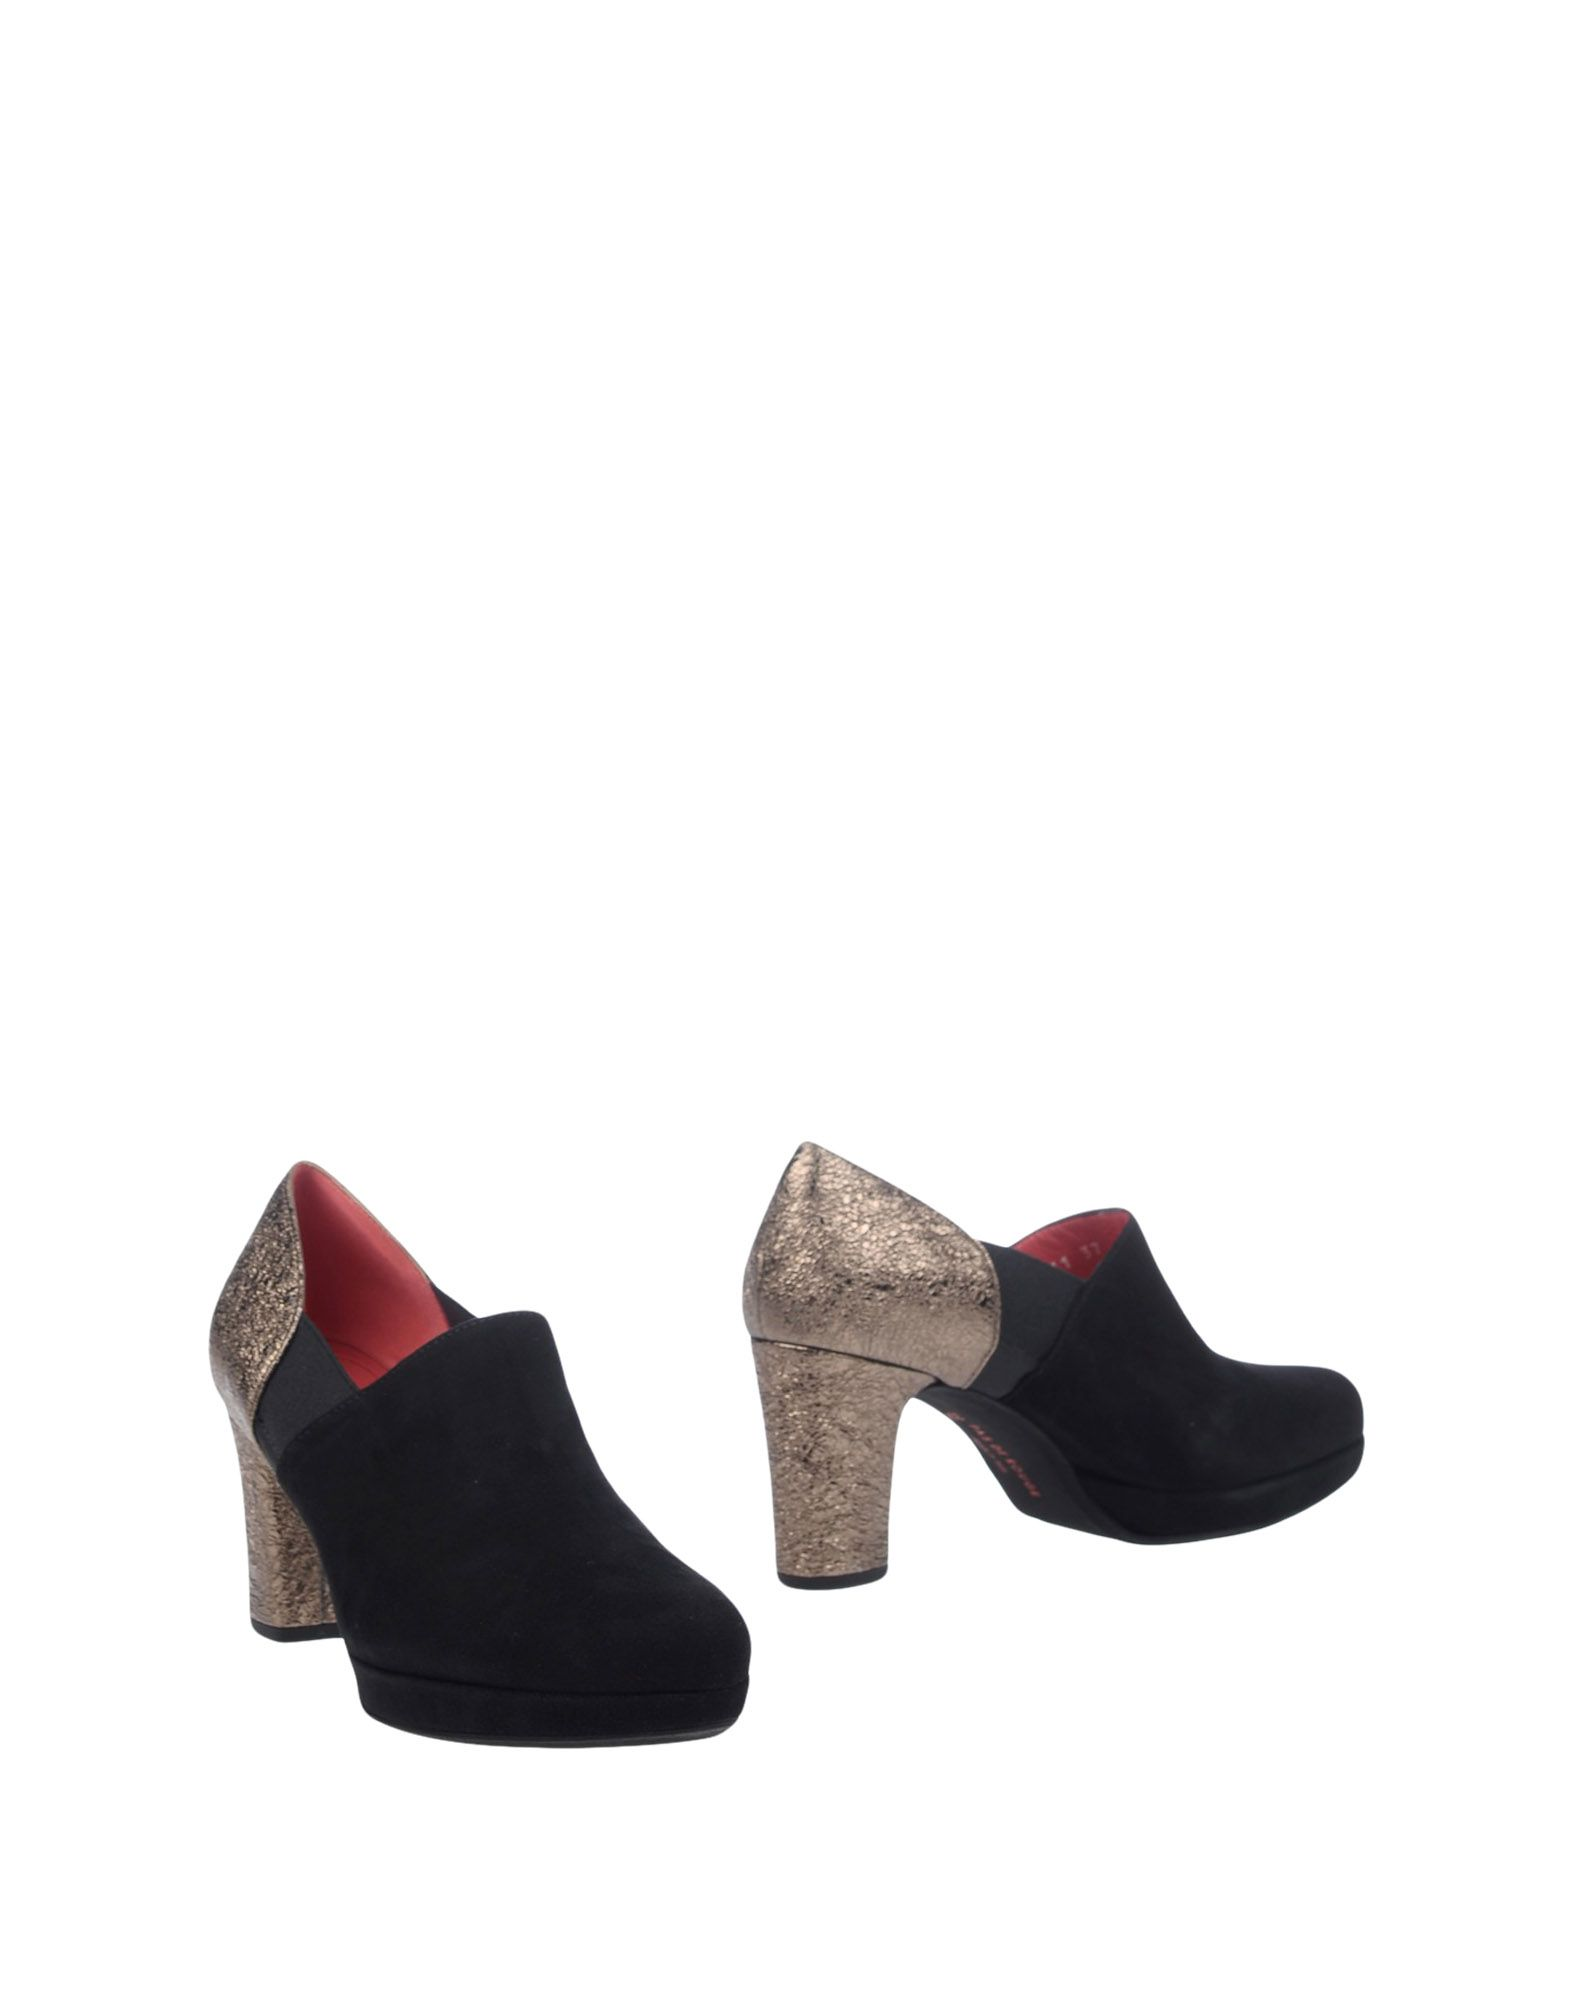 Pas De Rouge Stiefelette Damen  11288489FW Gute Qualität beliebte Schuhe